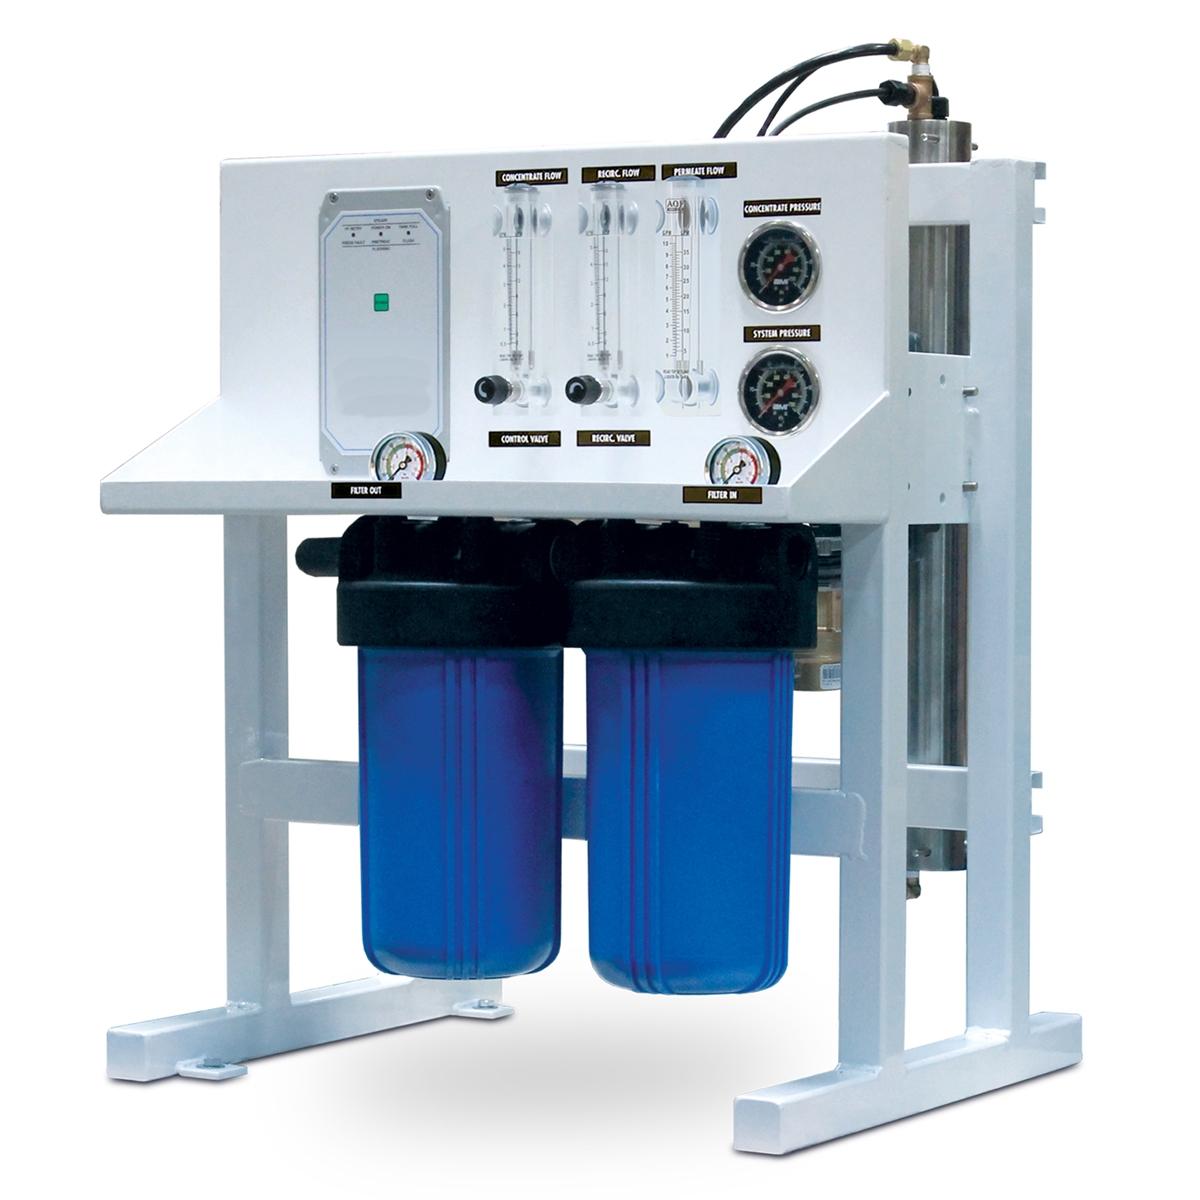 Fpcro 1000 P 1000 Gpd Reverse Osmosis System